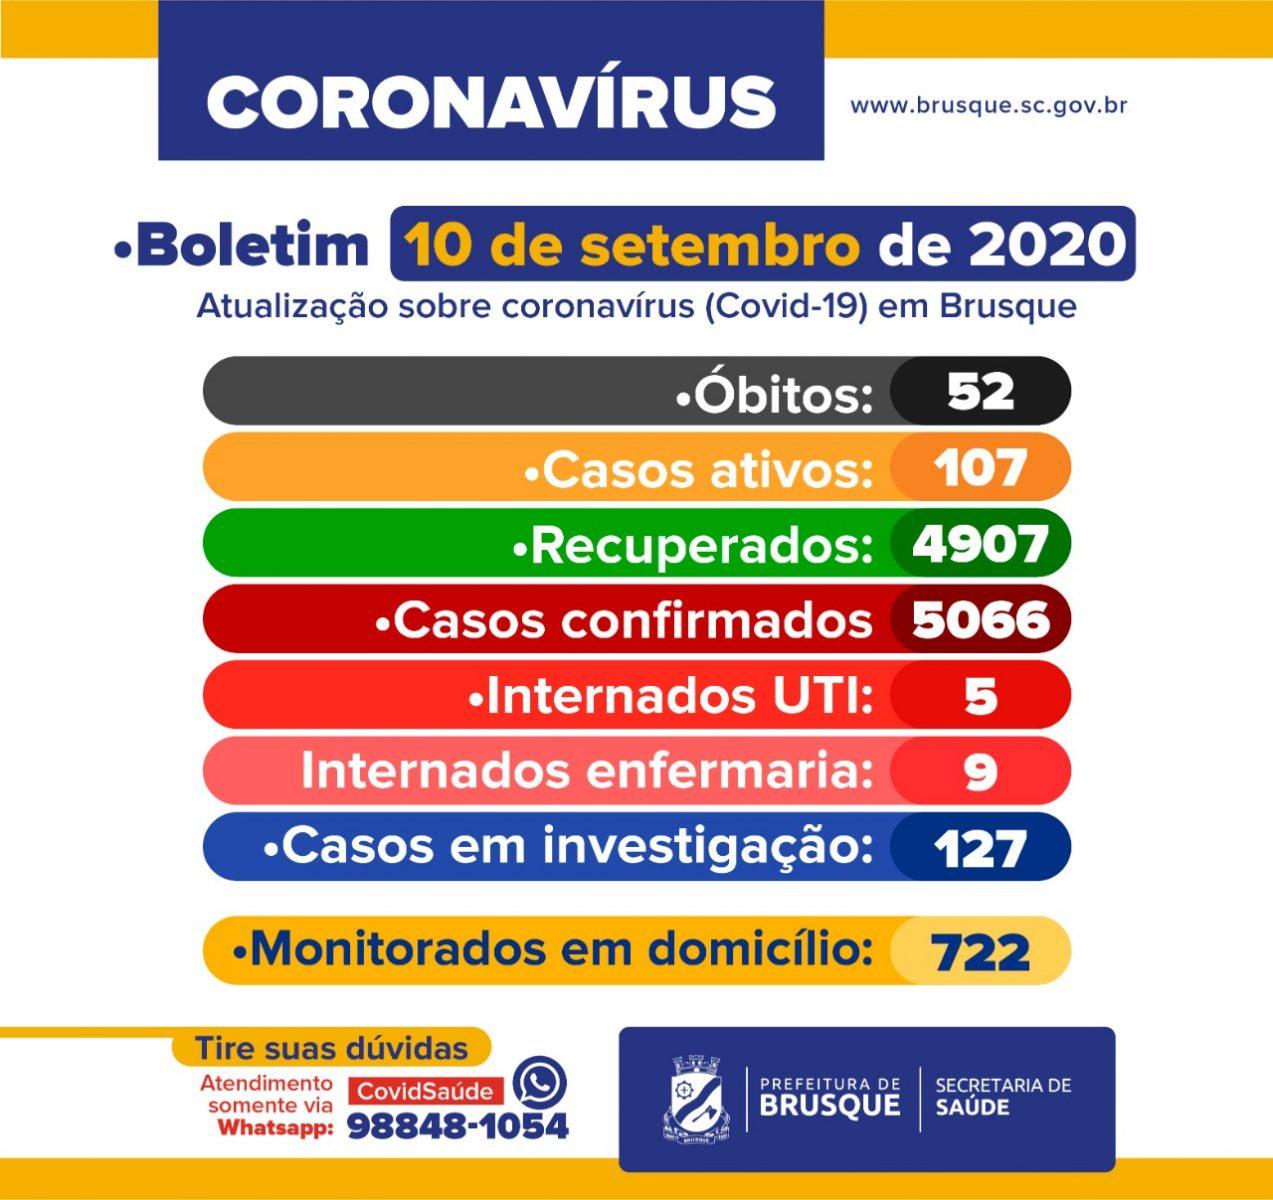 COVID-19: Boletim epidemiológico desta quinta, 10 de setembro